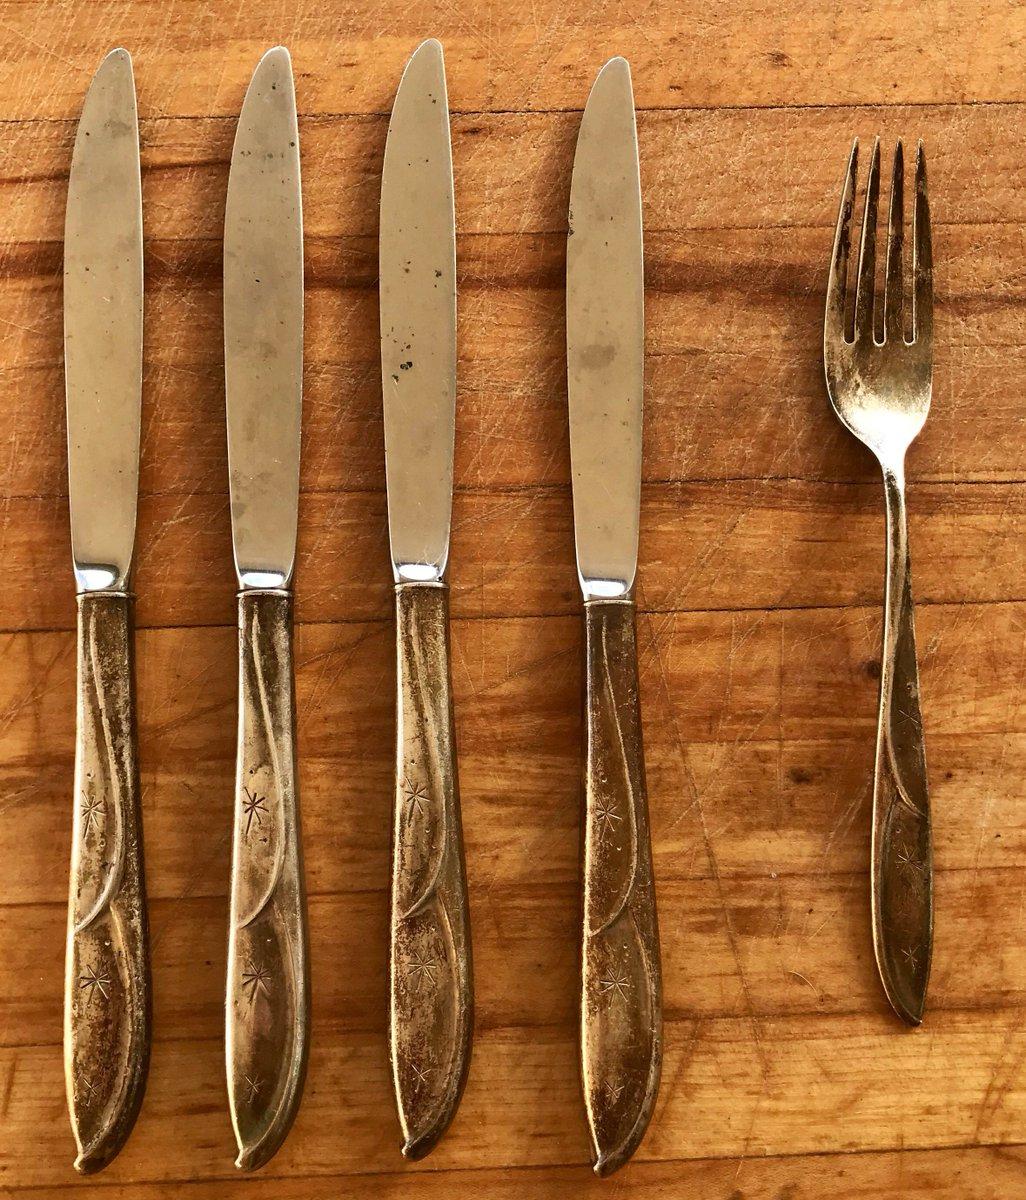 Mid-century modern Retro knives set of 9